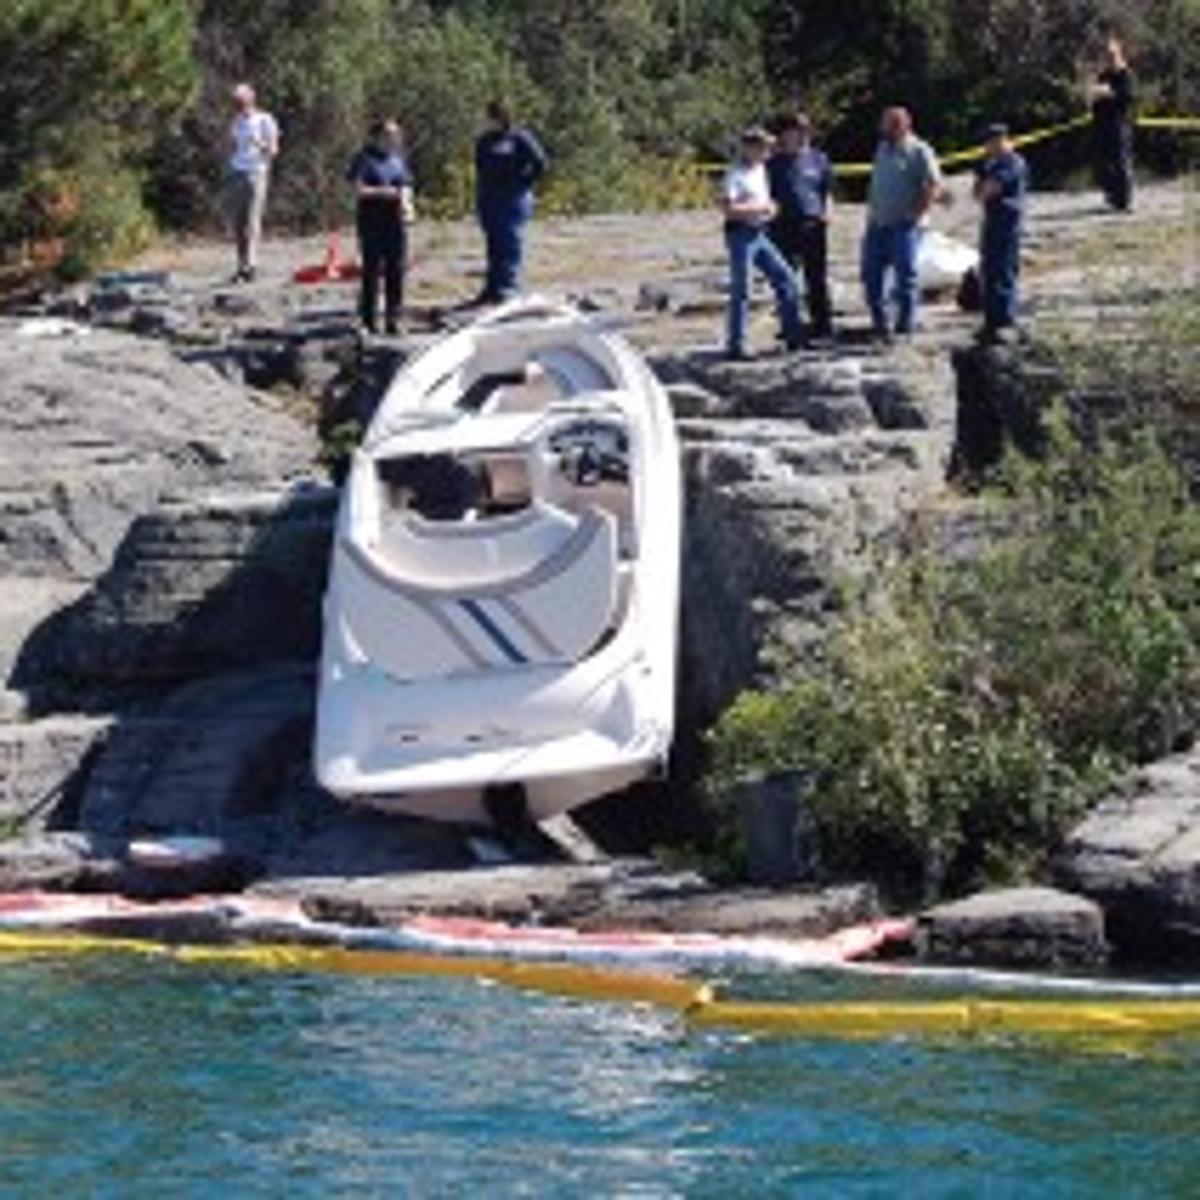 Judge rejects plea deal in Greg Barkus boat crash case